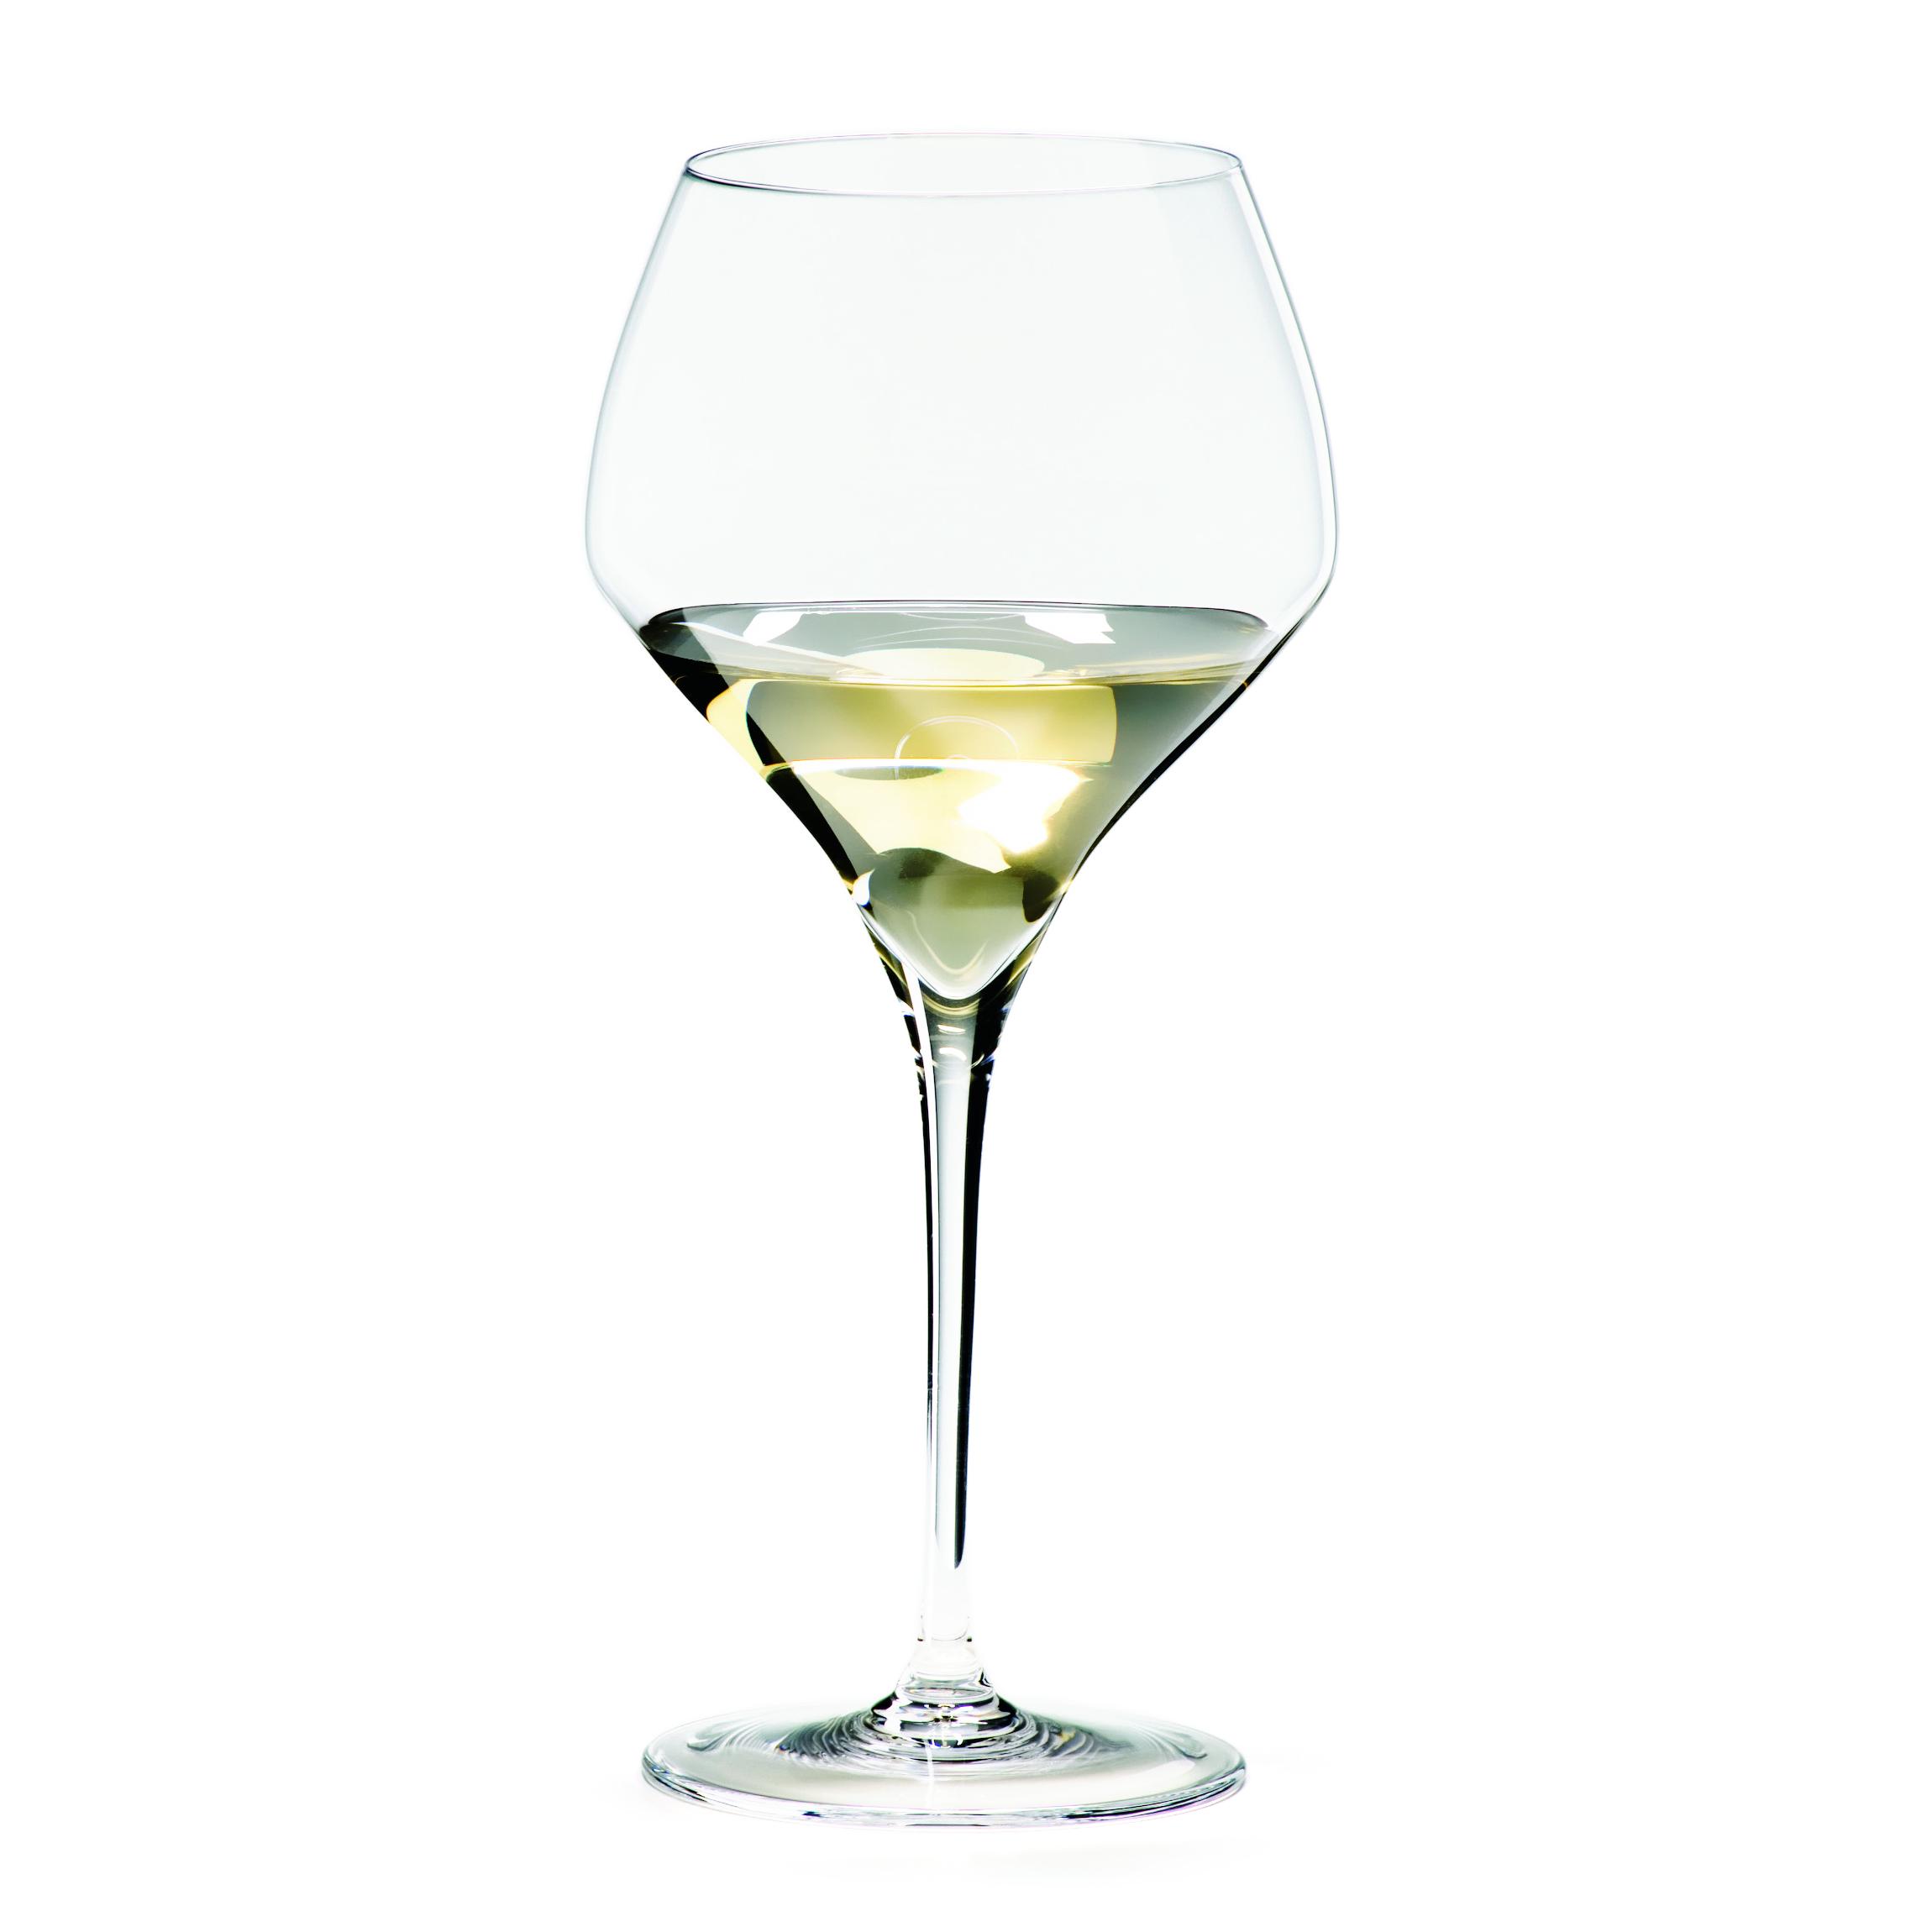 Riedel Vitis Leaded Crystal Oaked Chardonnay Montrachet Glass, Set of 2